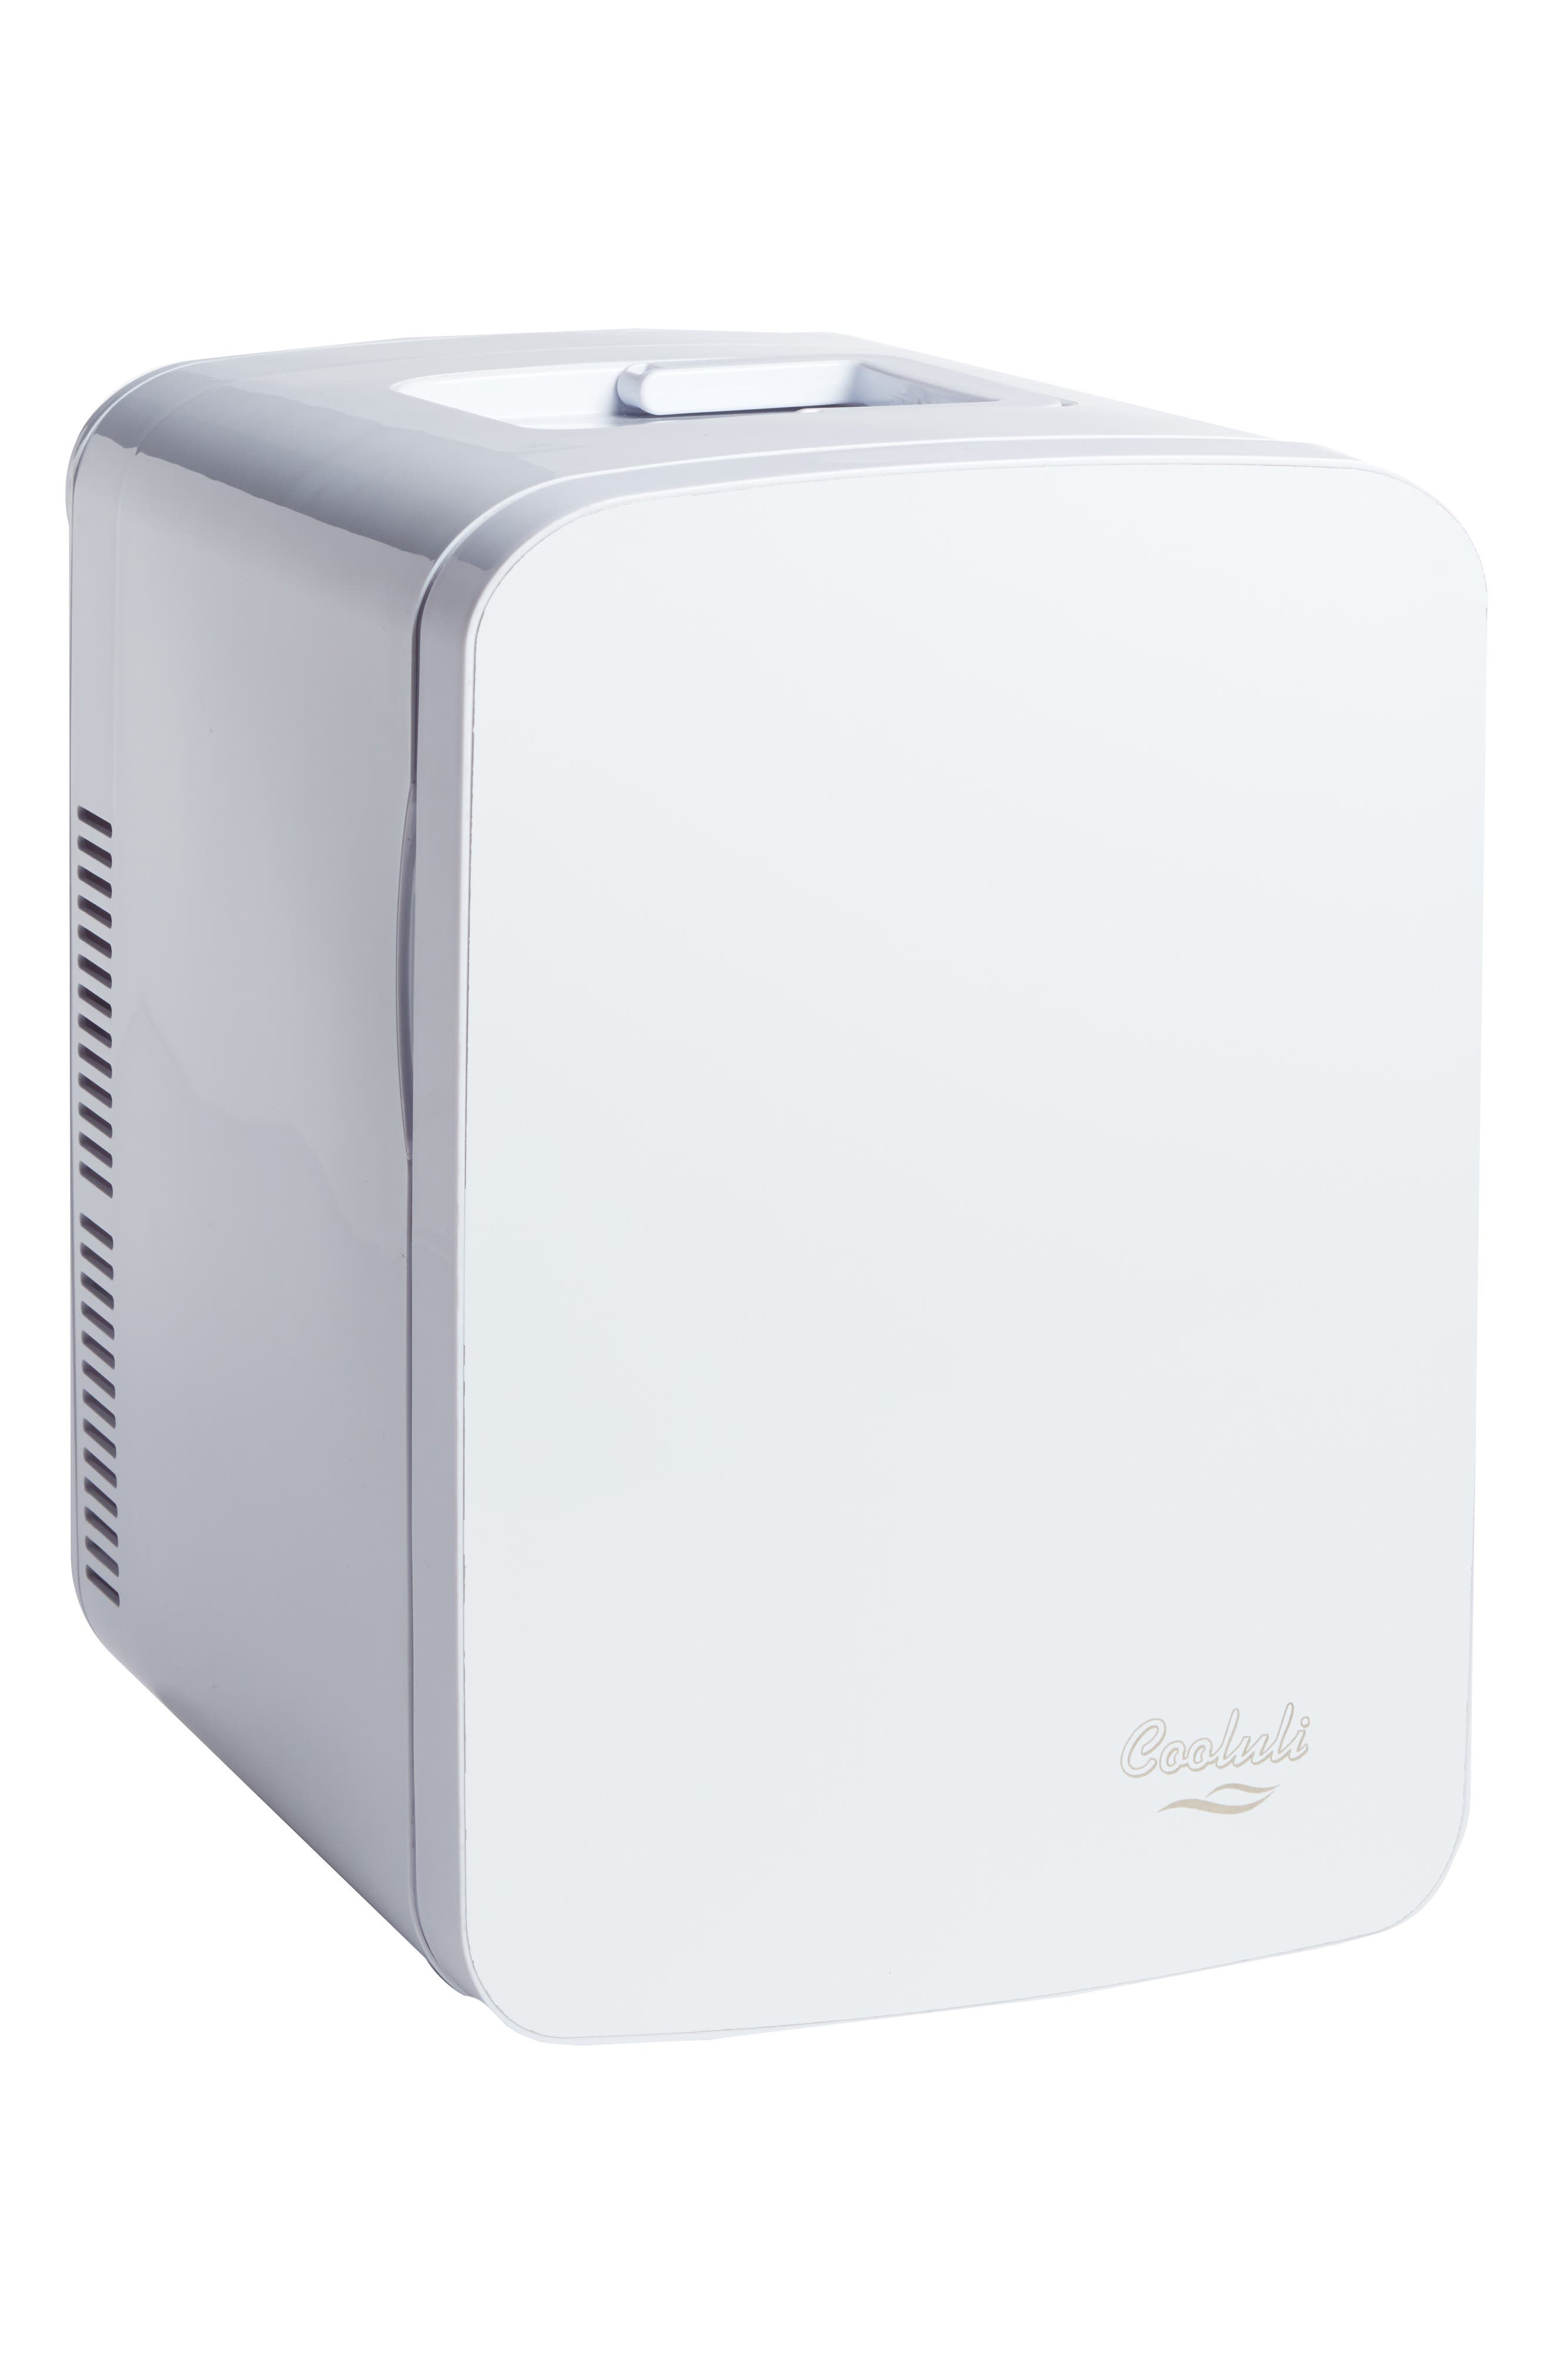 COOLULI, The Vibe Whiteboard 15L Thermoelectric Mini Beauty Fridge & Warmer, Alternate thumbnail 3, color, 100